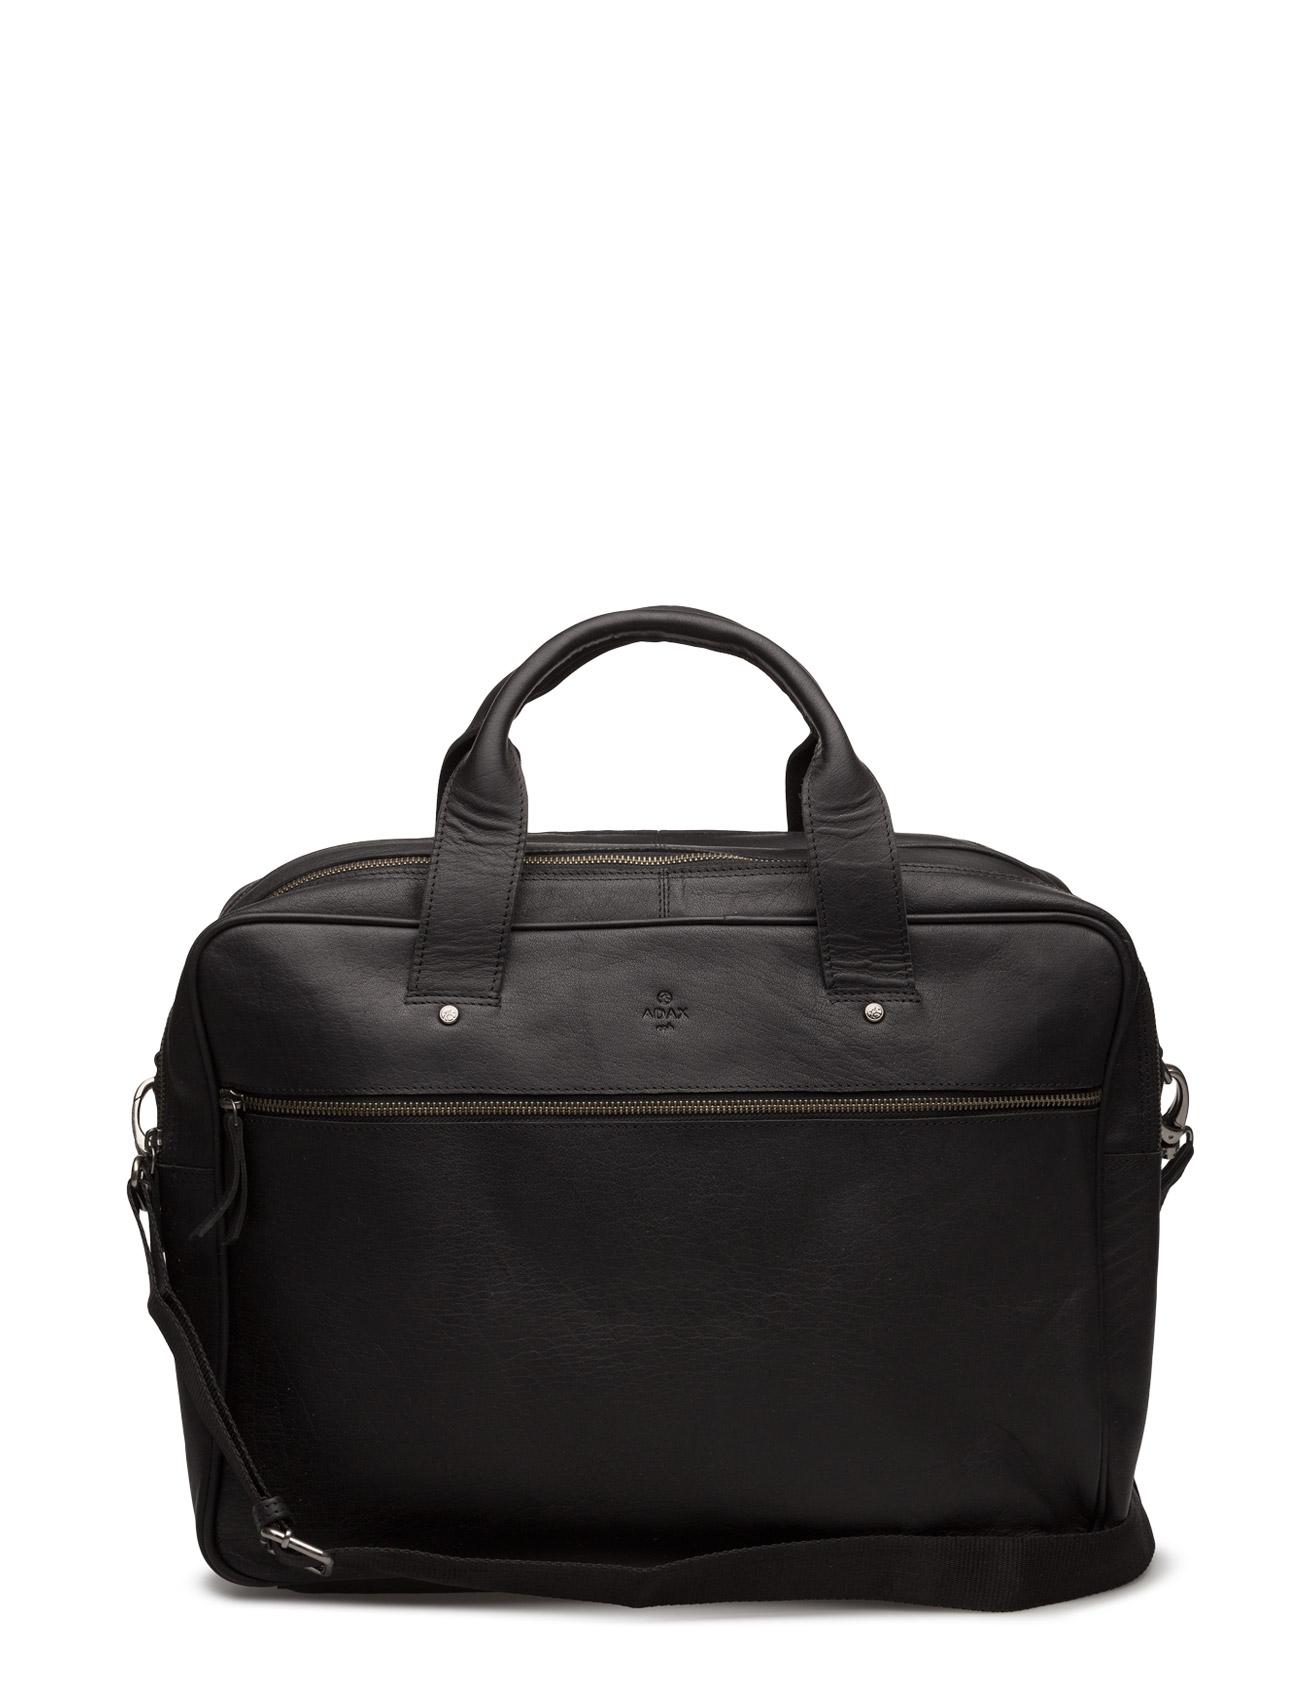 Kb3 Working Bag Liam - Adax